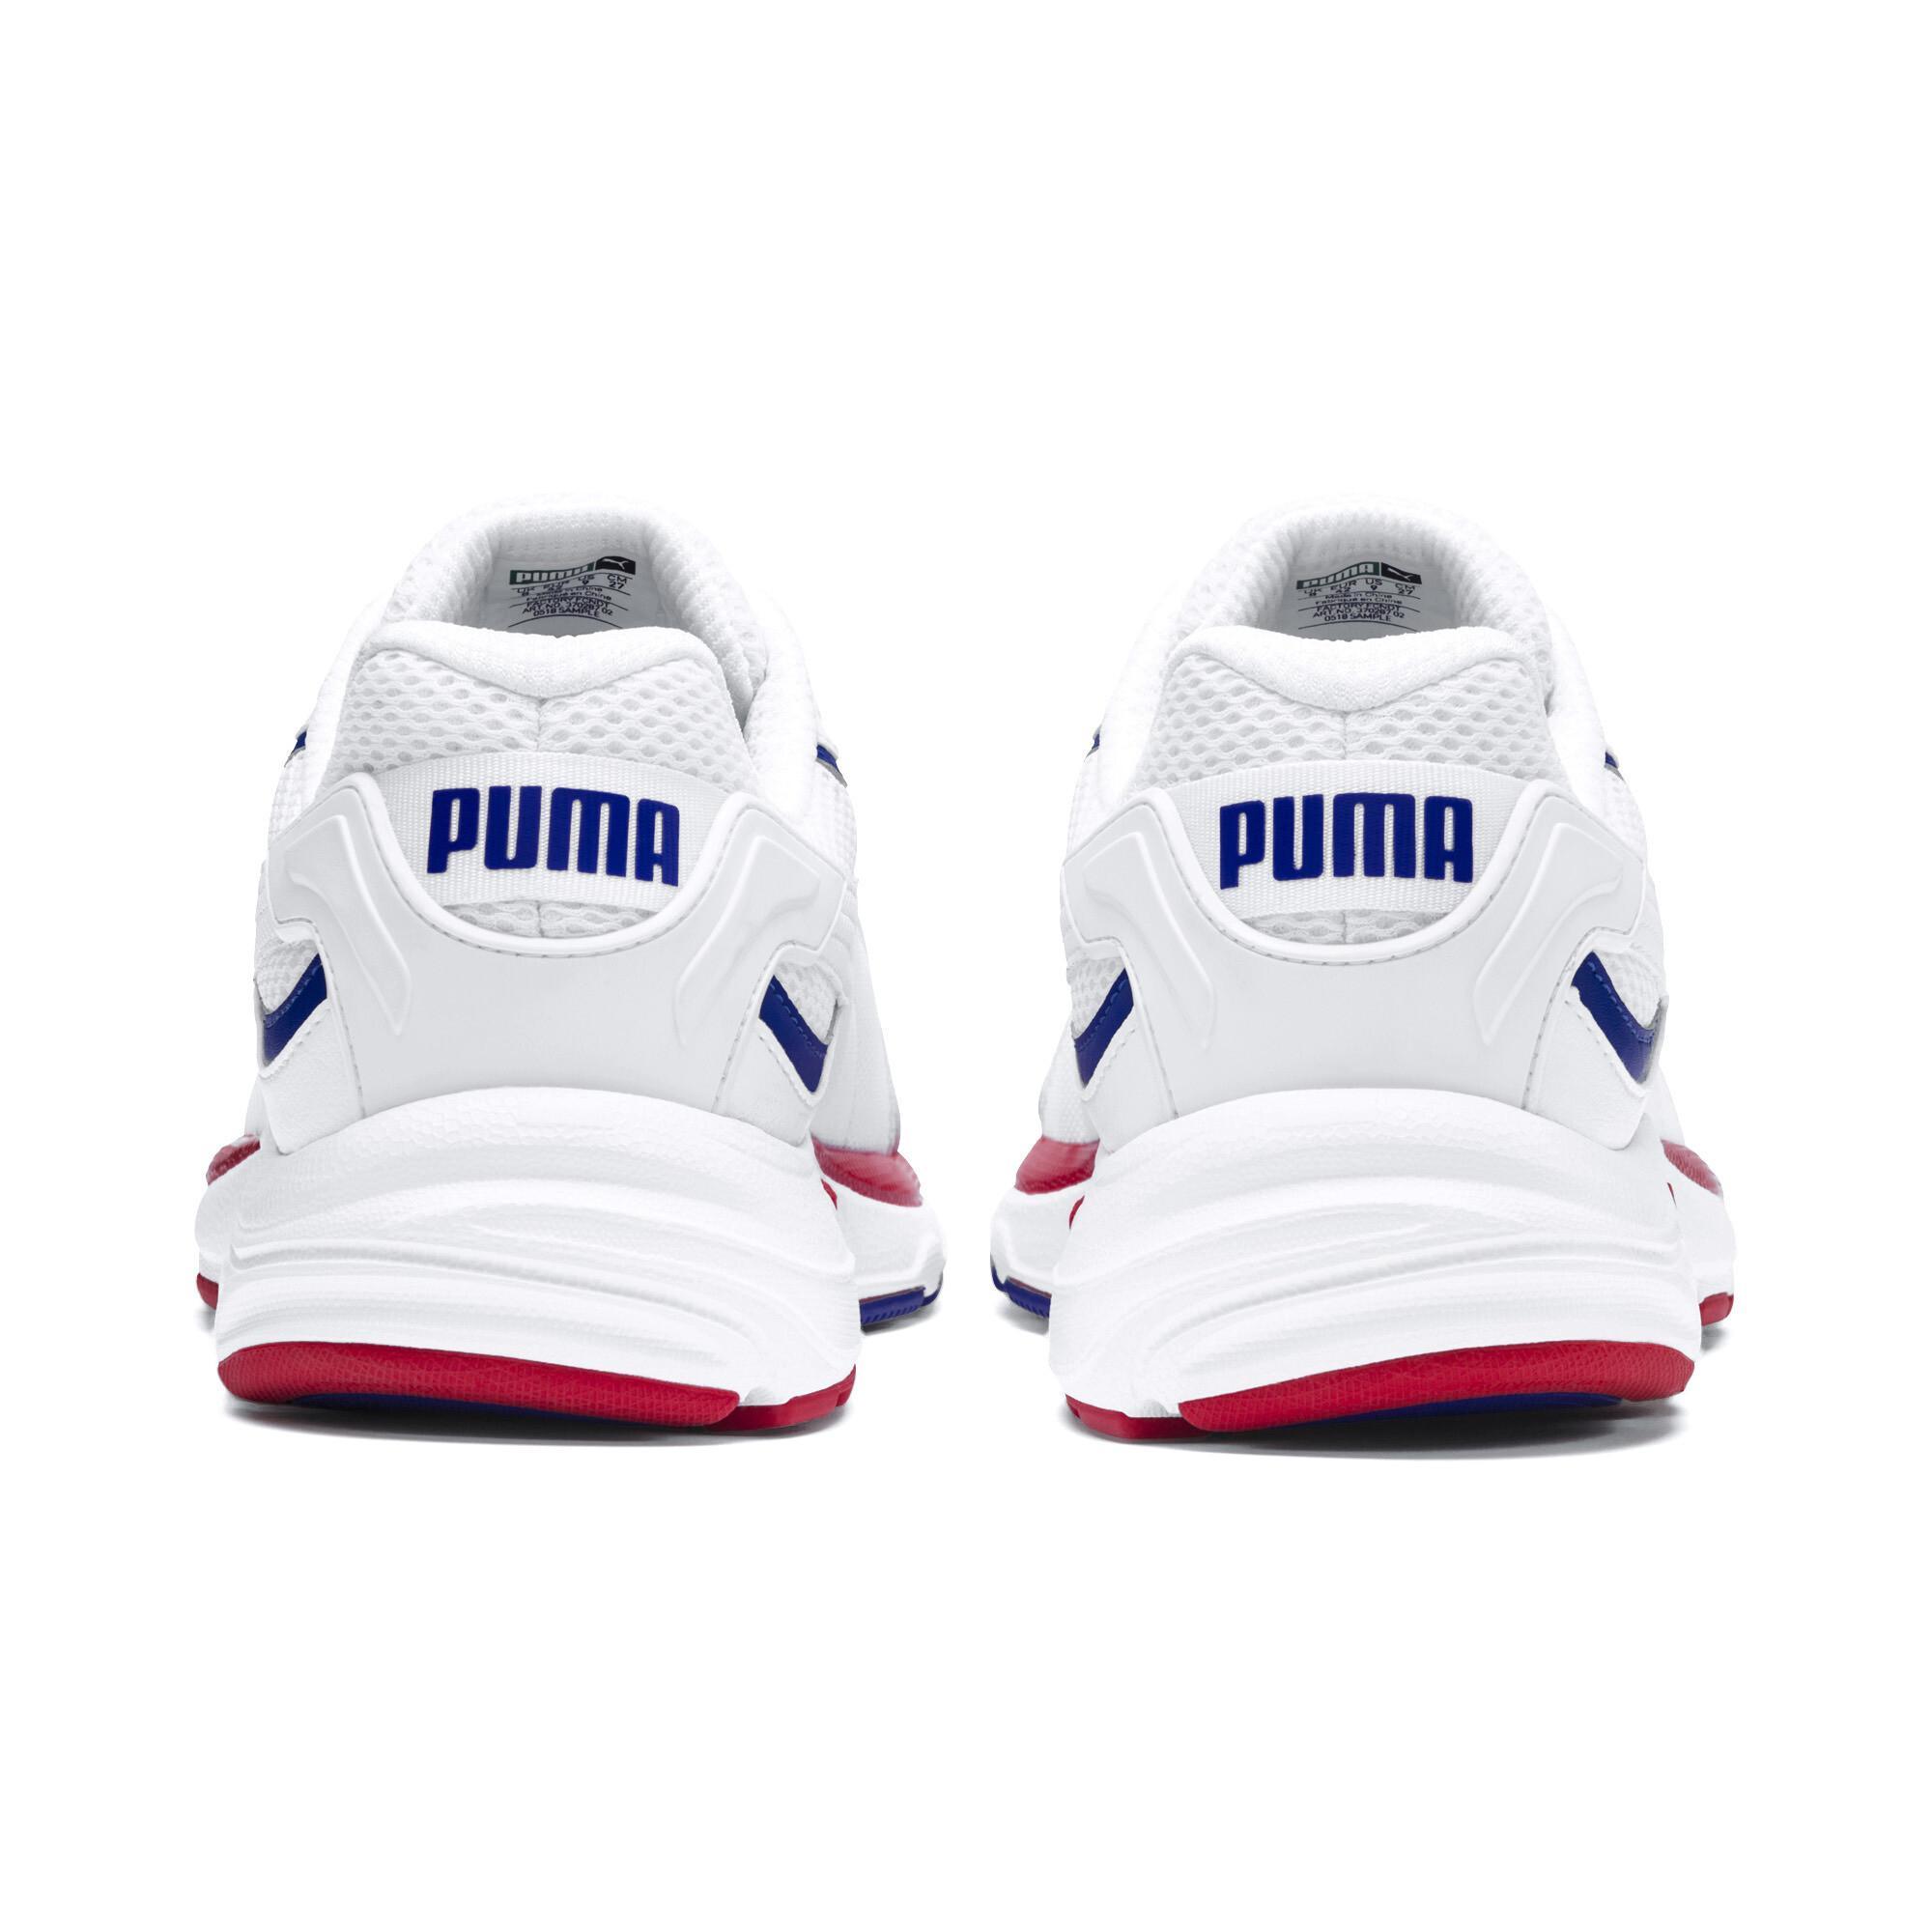 PUMA-Axis-Plus-90s-Sneakers-Men-Shoe-Basics thumbnail 7